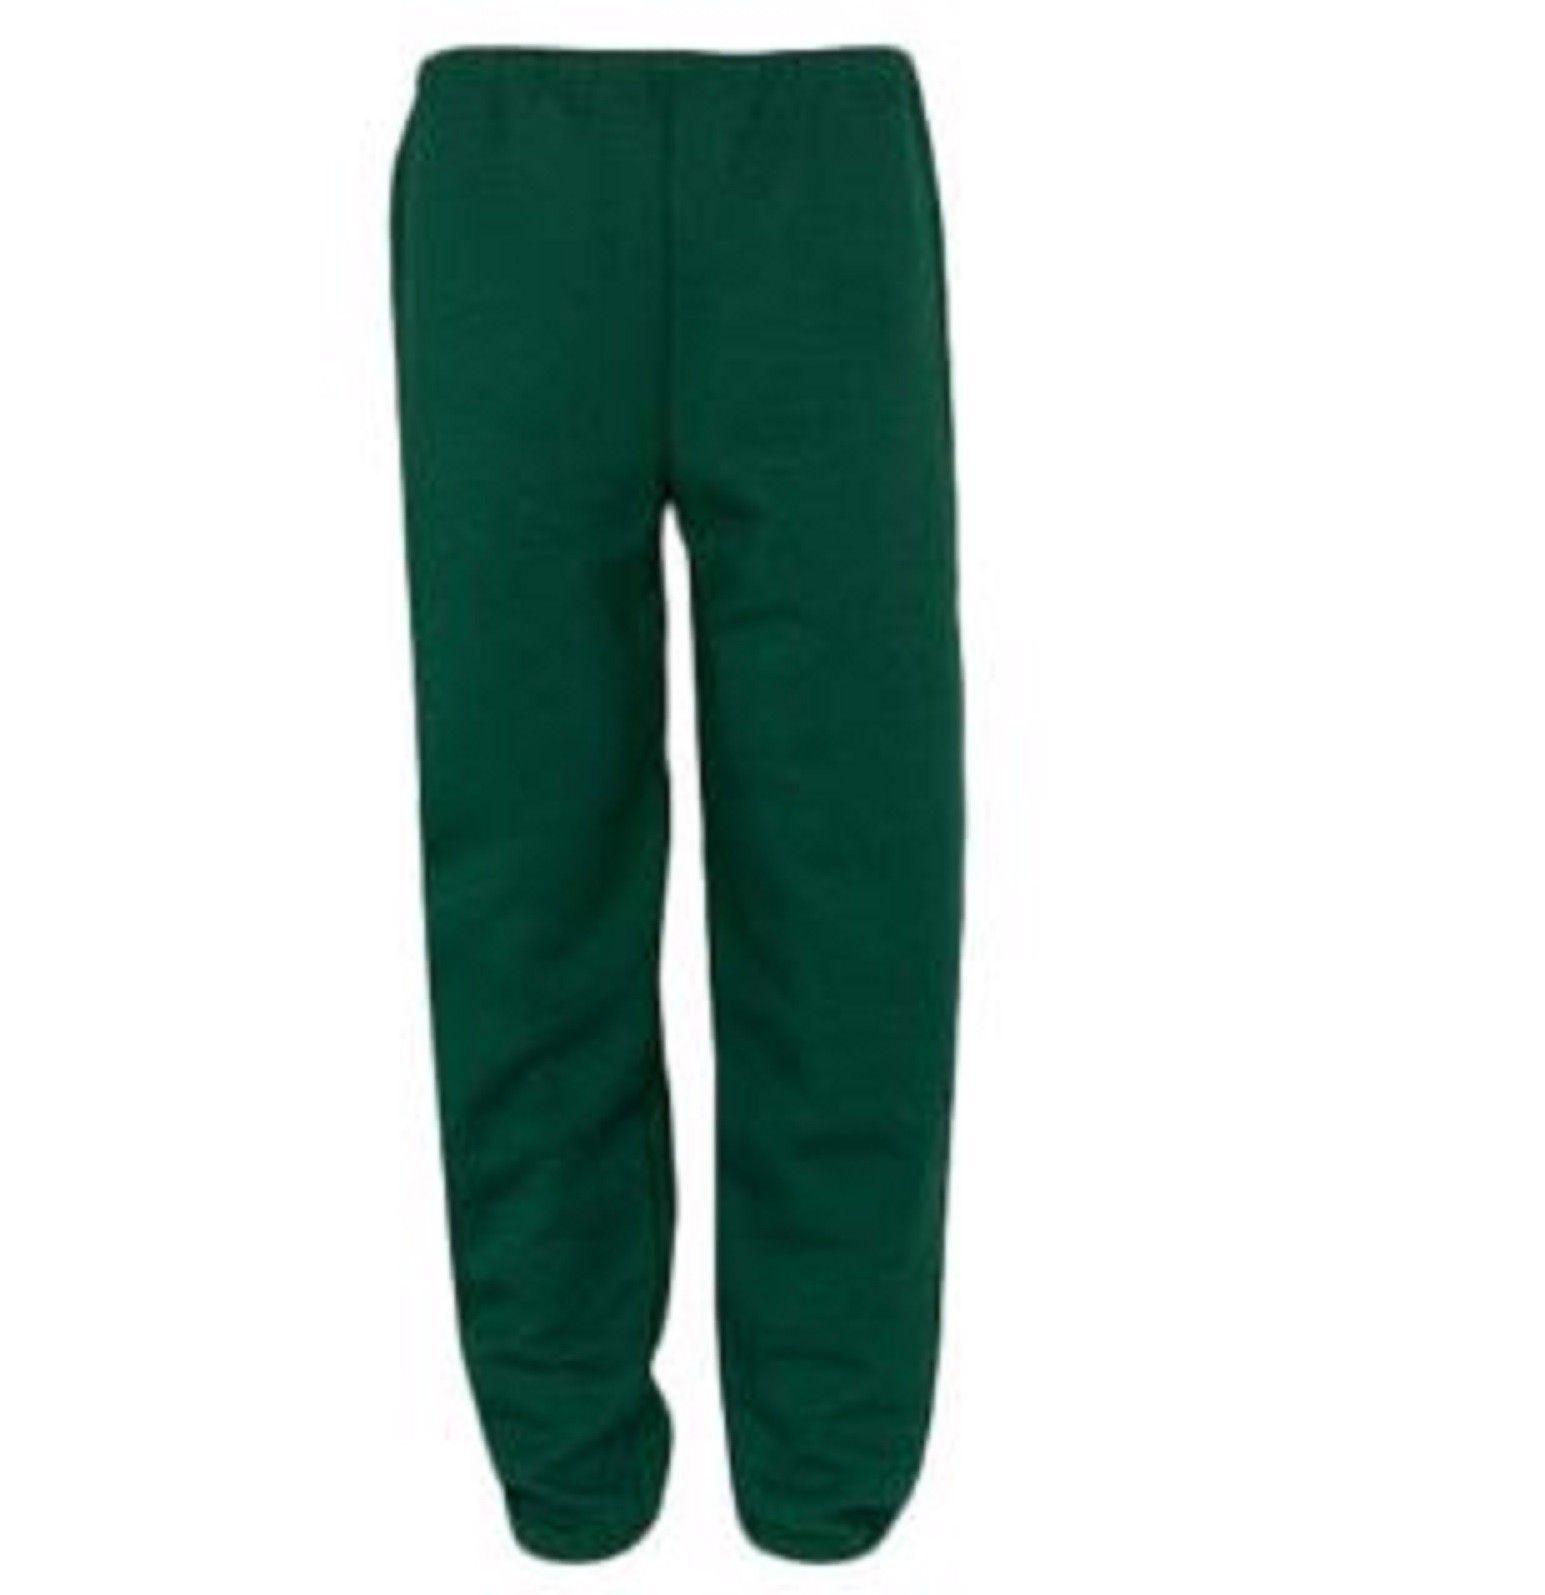 b8c52b22 GRT Sports Athletic Men's Big Tall Sweatpants Jogging Pants